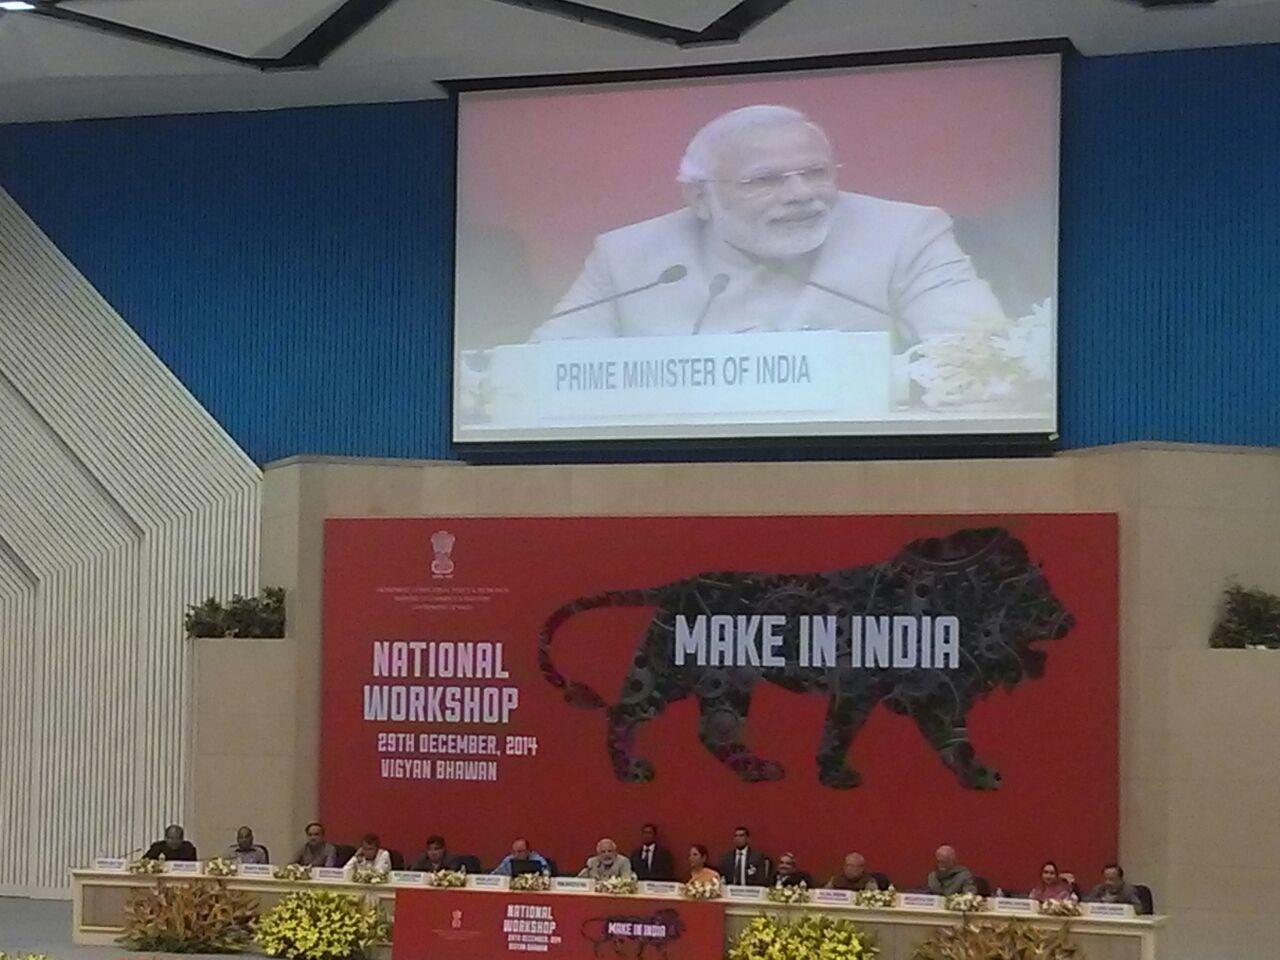 RT @makeinindia_: QOTD by PM: 'We will embark on the ROAD of Reliability, Ownership, Accountability & Discipline' #MakeInIndia #MIILive htt…